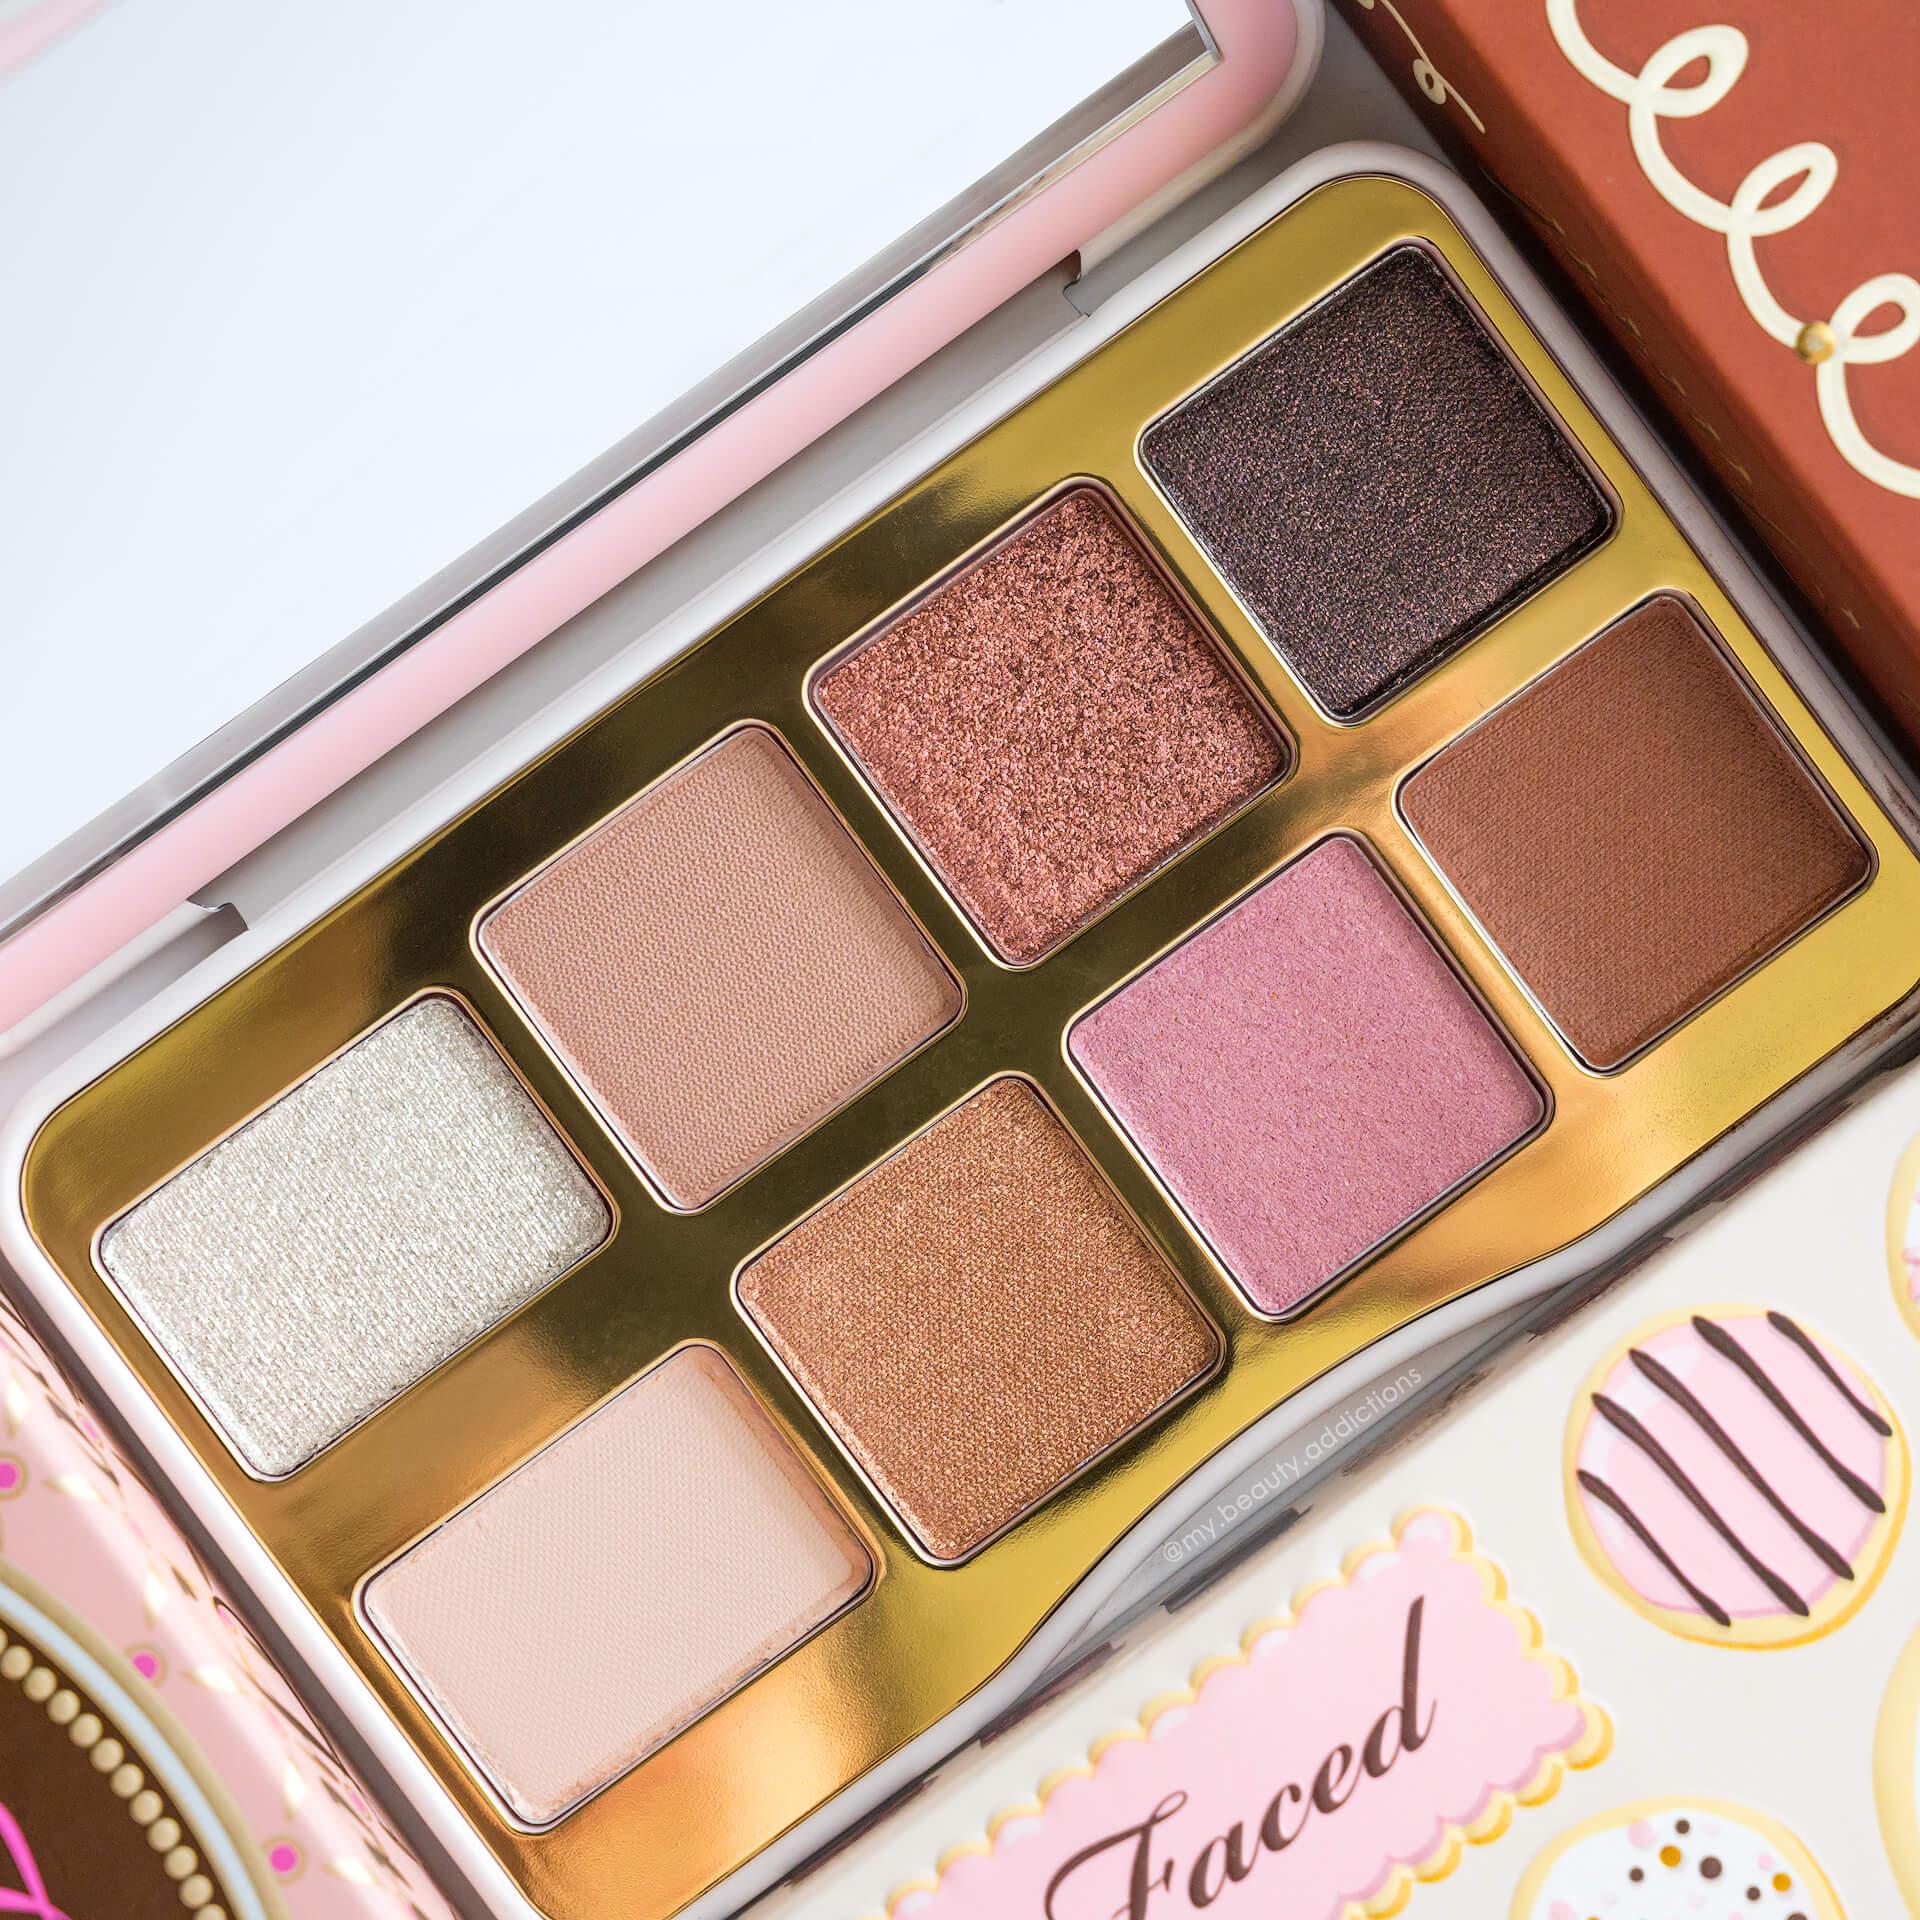 Sugar Cookie Eyeshadow Palette by Too Faced #8